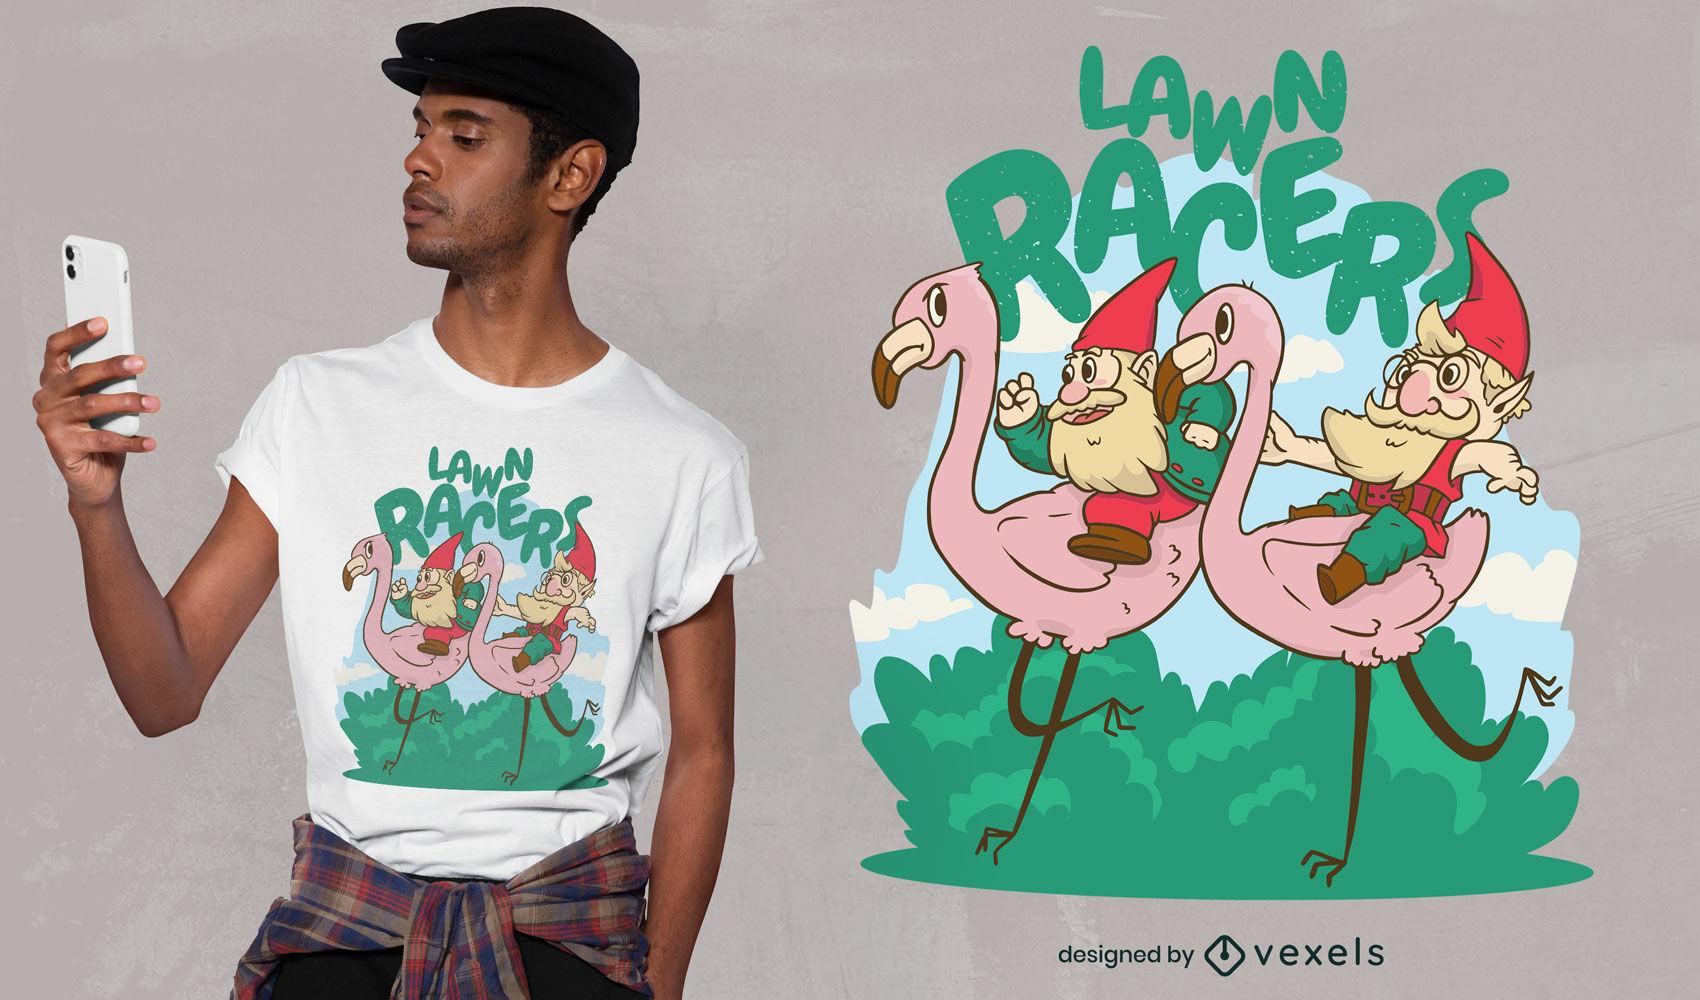 Cool lawn gnomes t-shirt desing